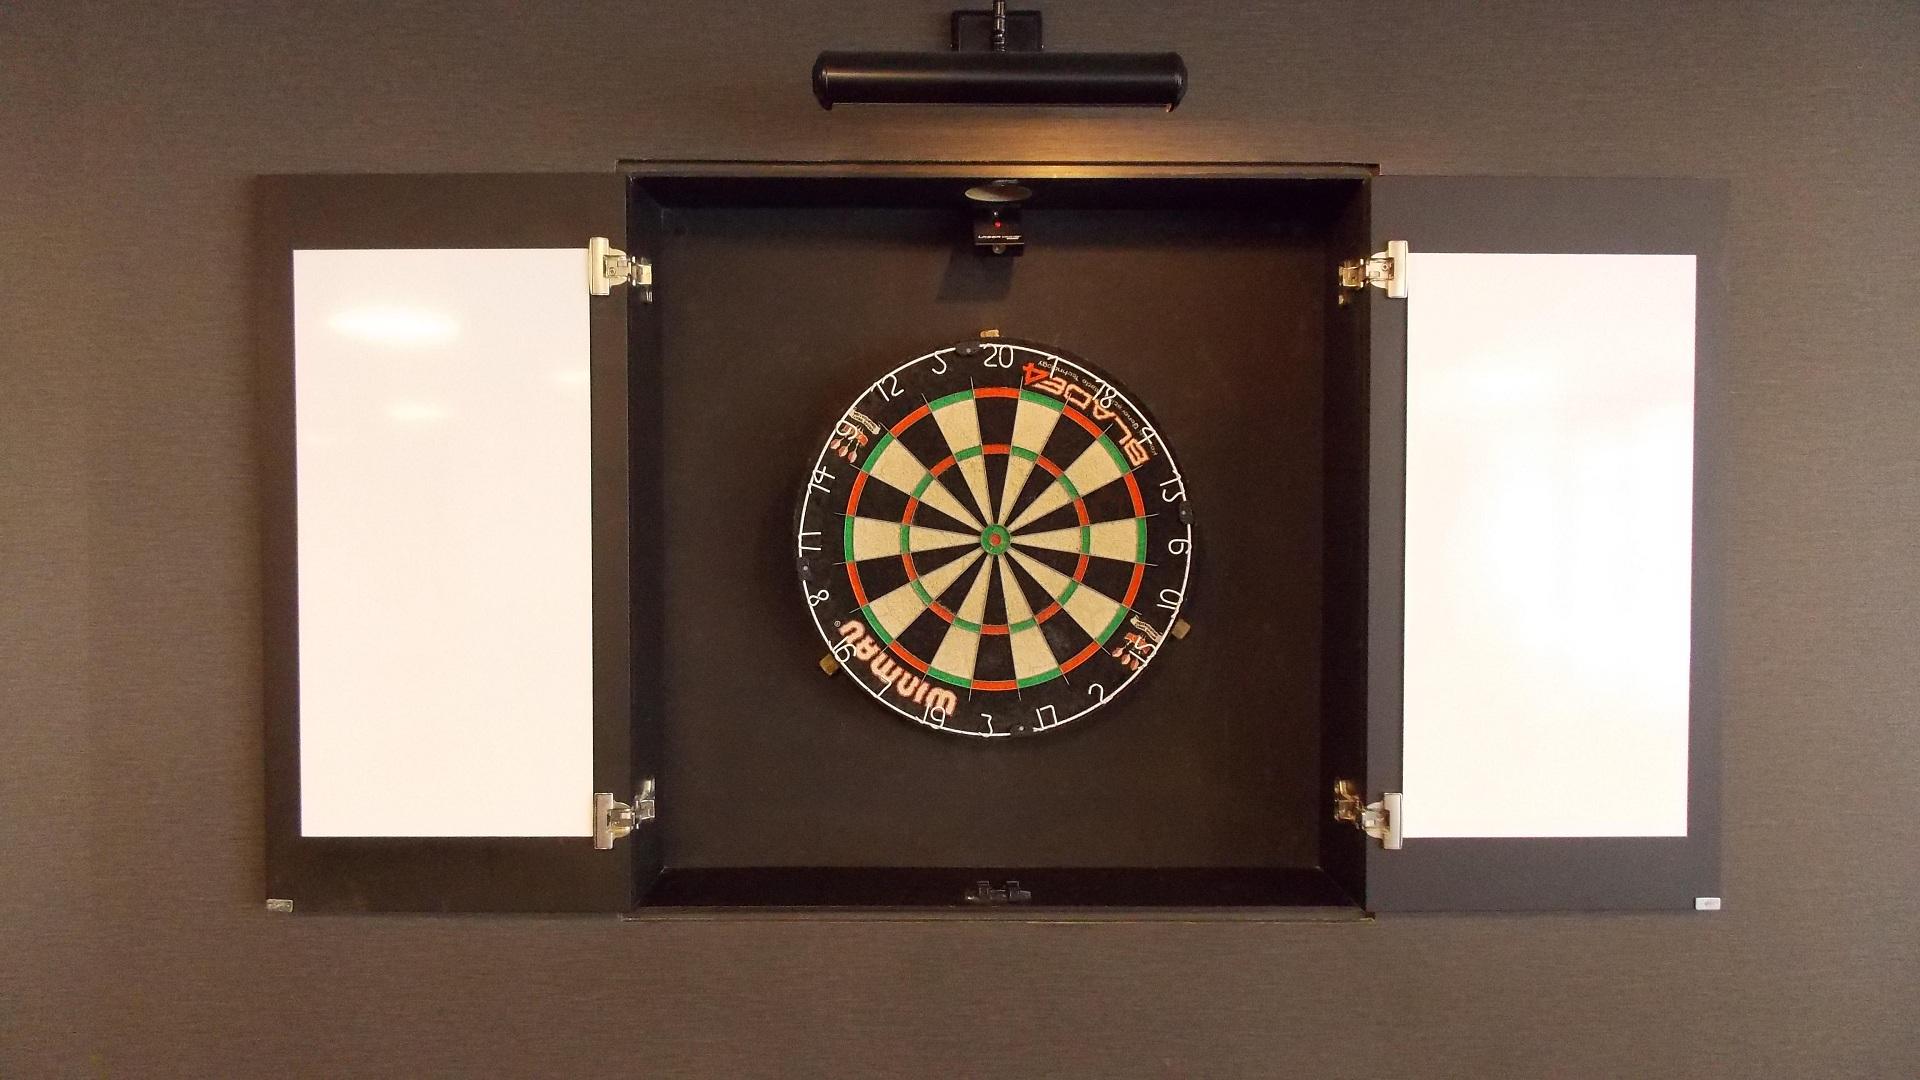 dart board hd wallpapers - photo #10